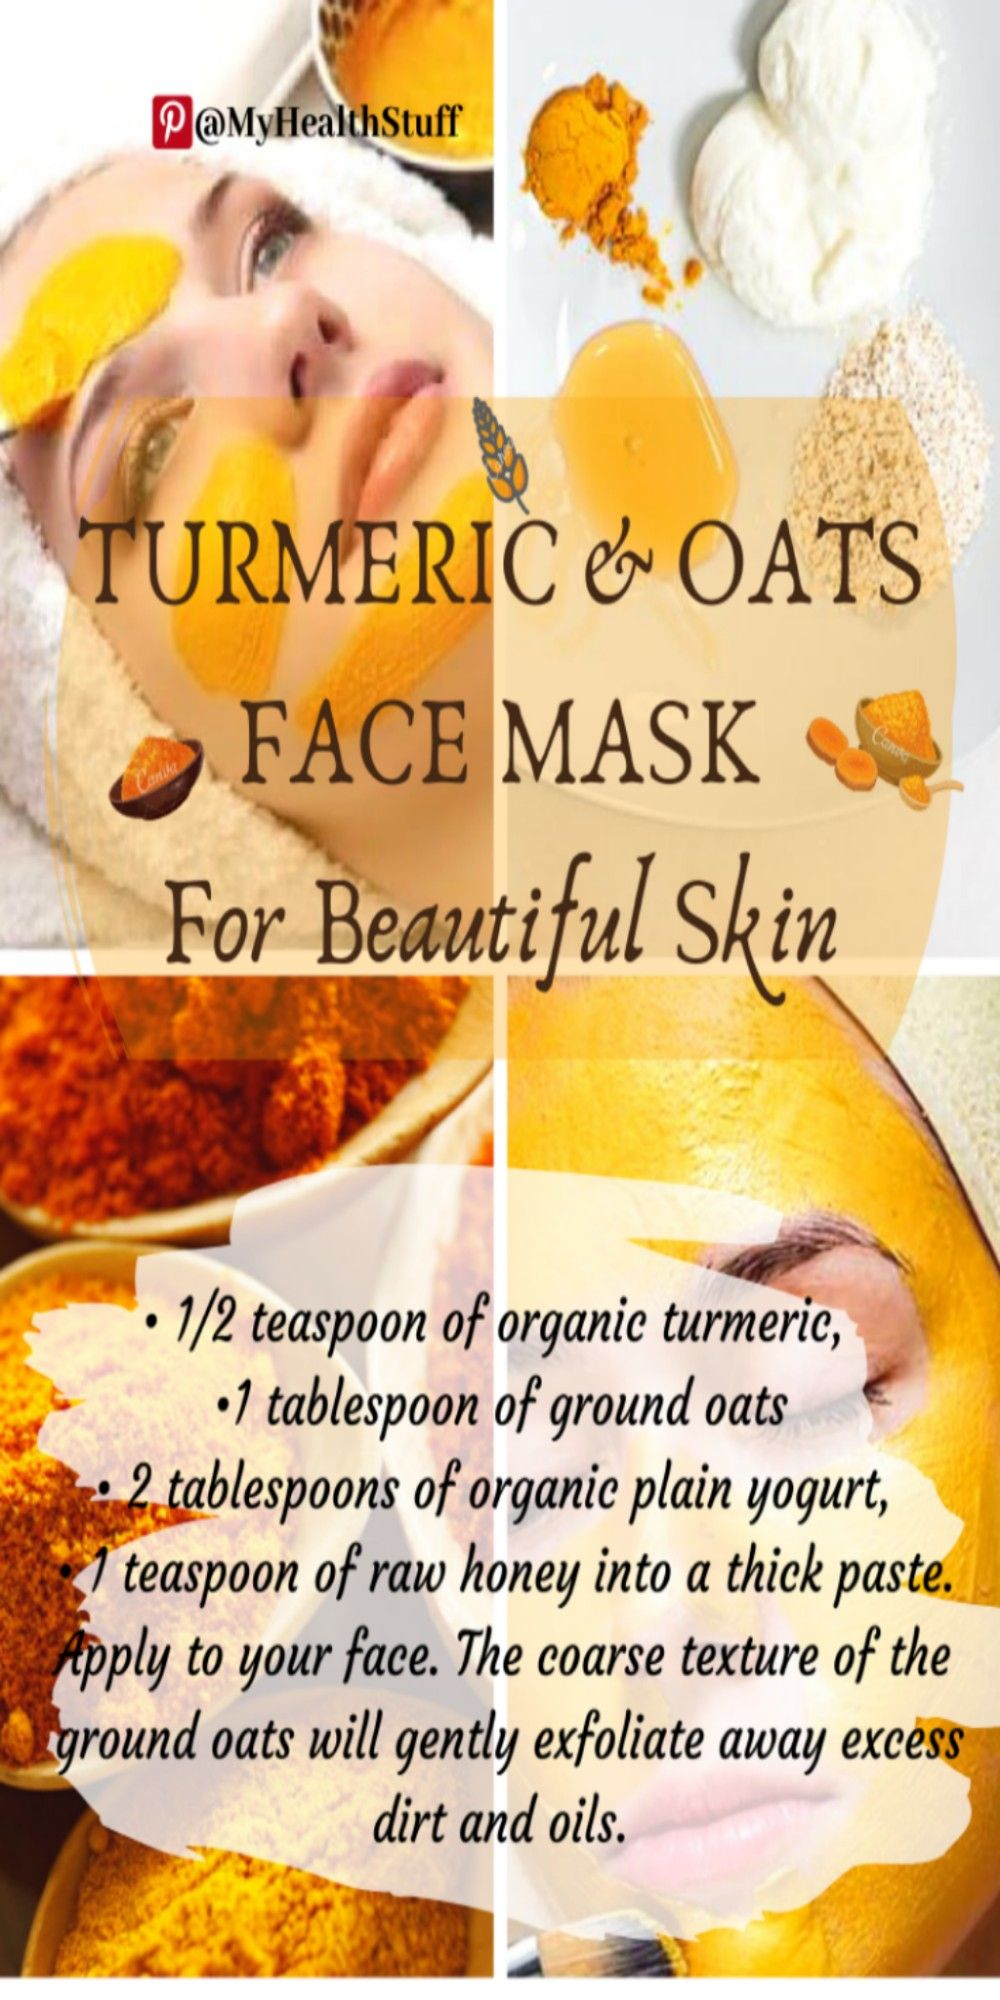 Turmeric & Oats Face Mask For Beautiful Skin in 10  Oats face